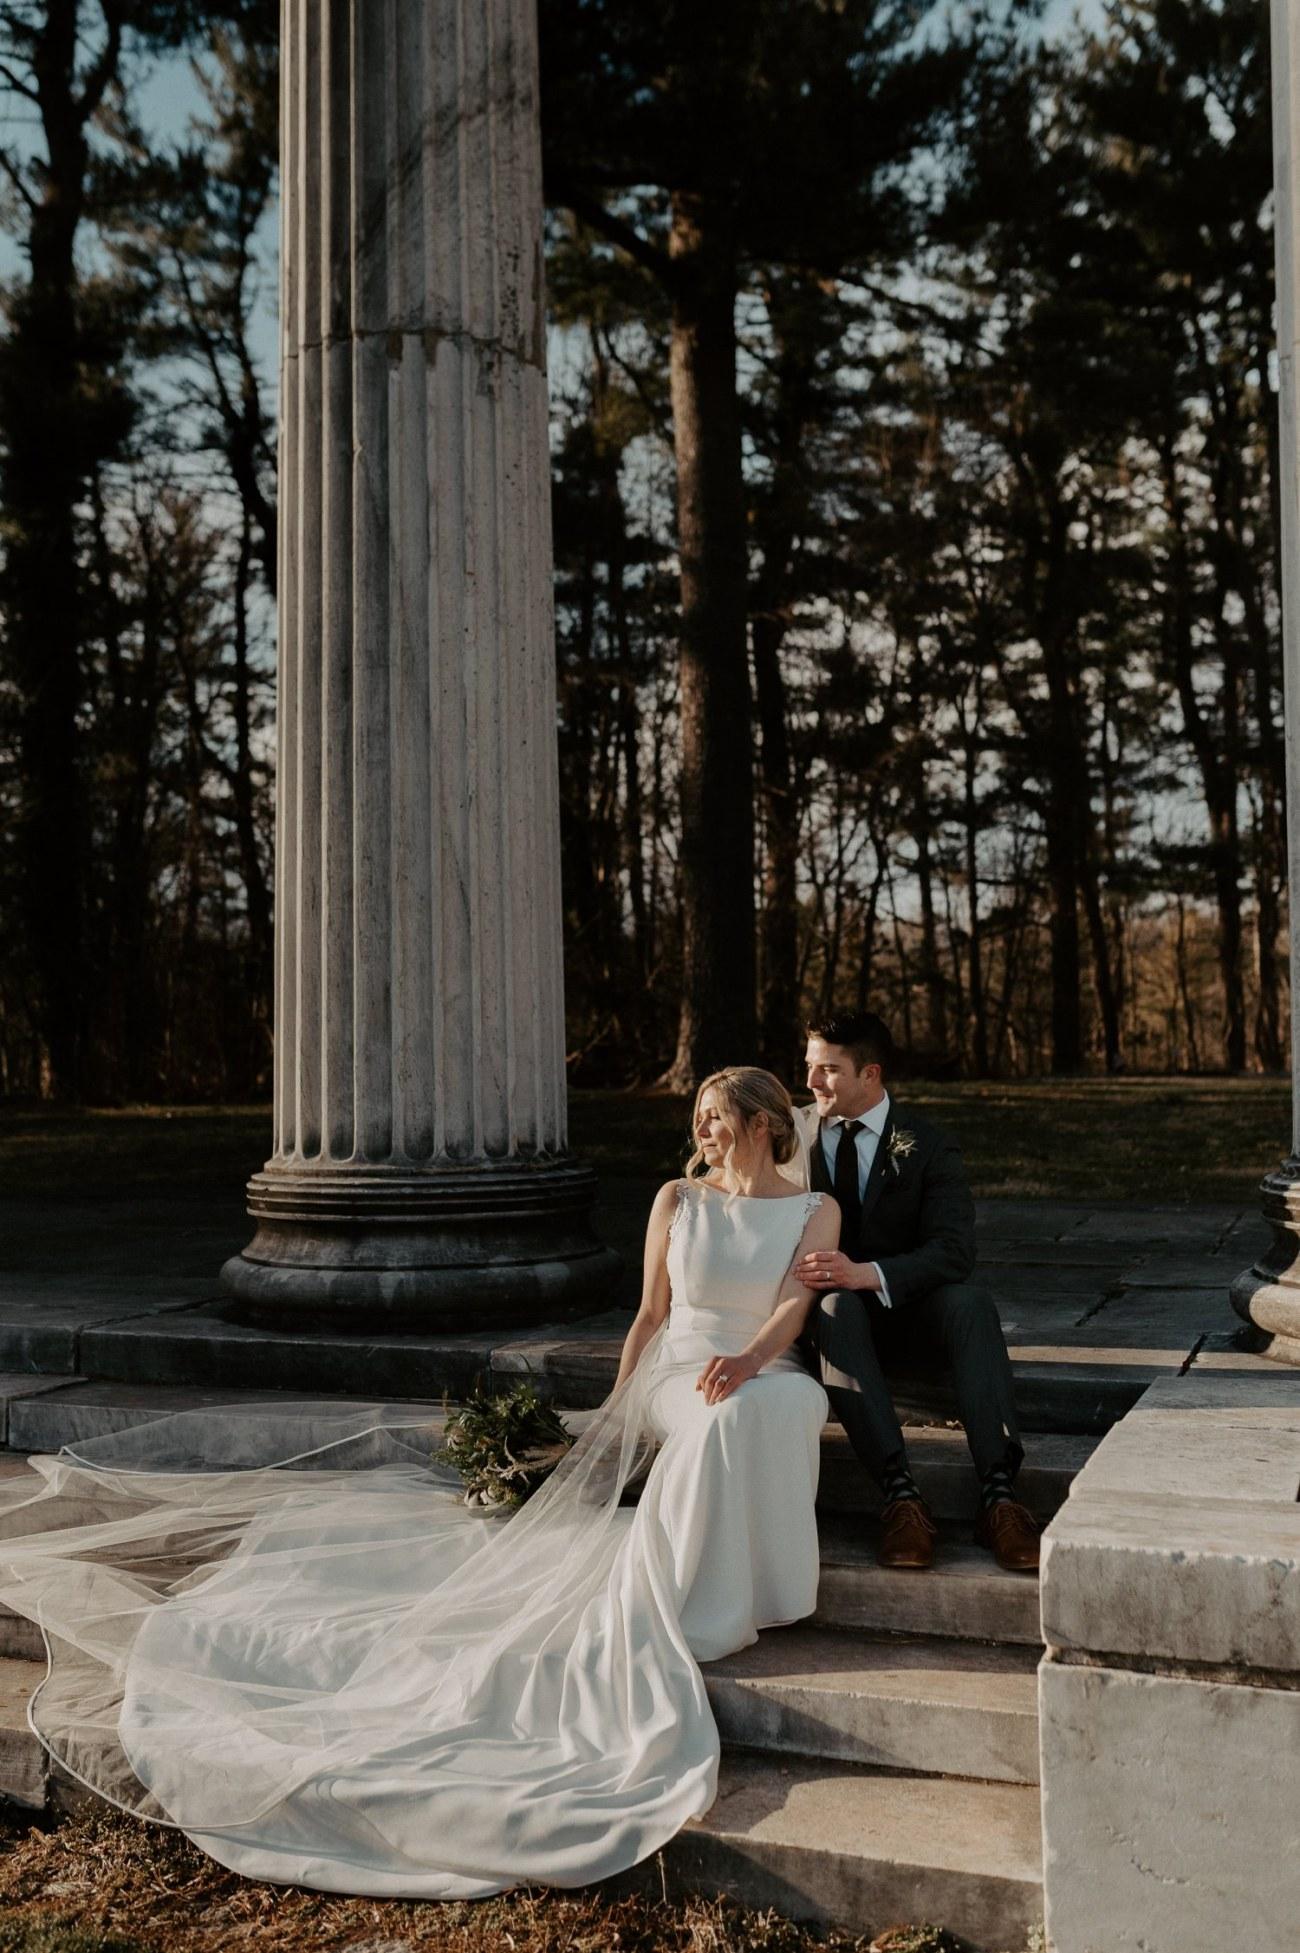 Princeton Battlefield Wedding Princeton University Elopement New Jersey Wedding Photographer Anais Possamai Photography 28